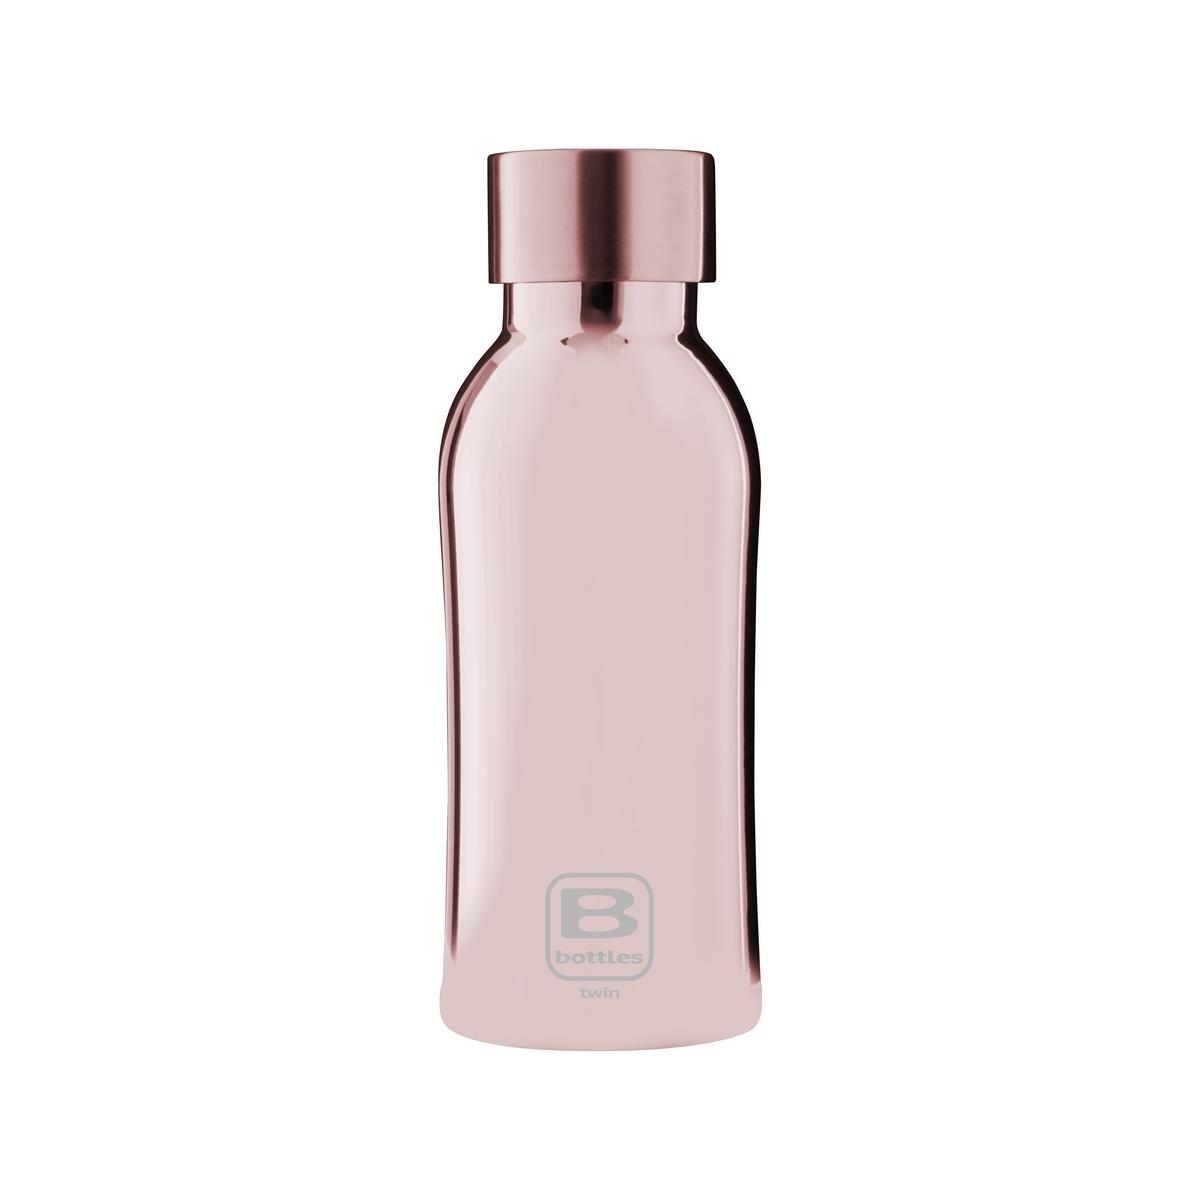 B Bottles Twin - Rose Gold Lux - 350 ml - Bottiglia Termica a doppia parete in acciaio inox 18/10